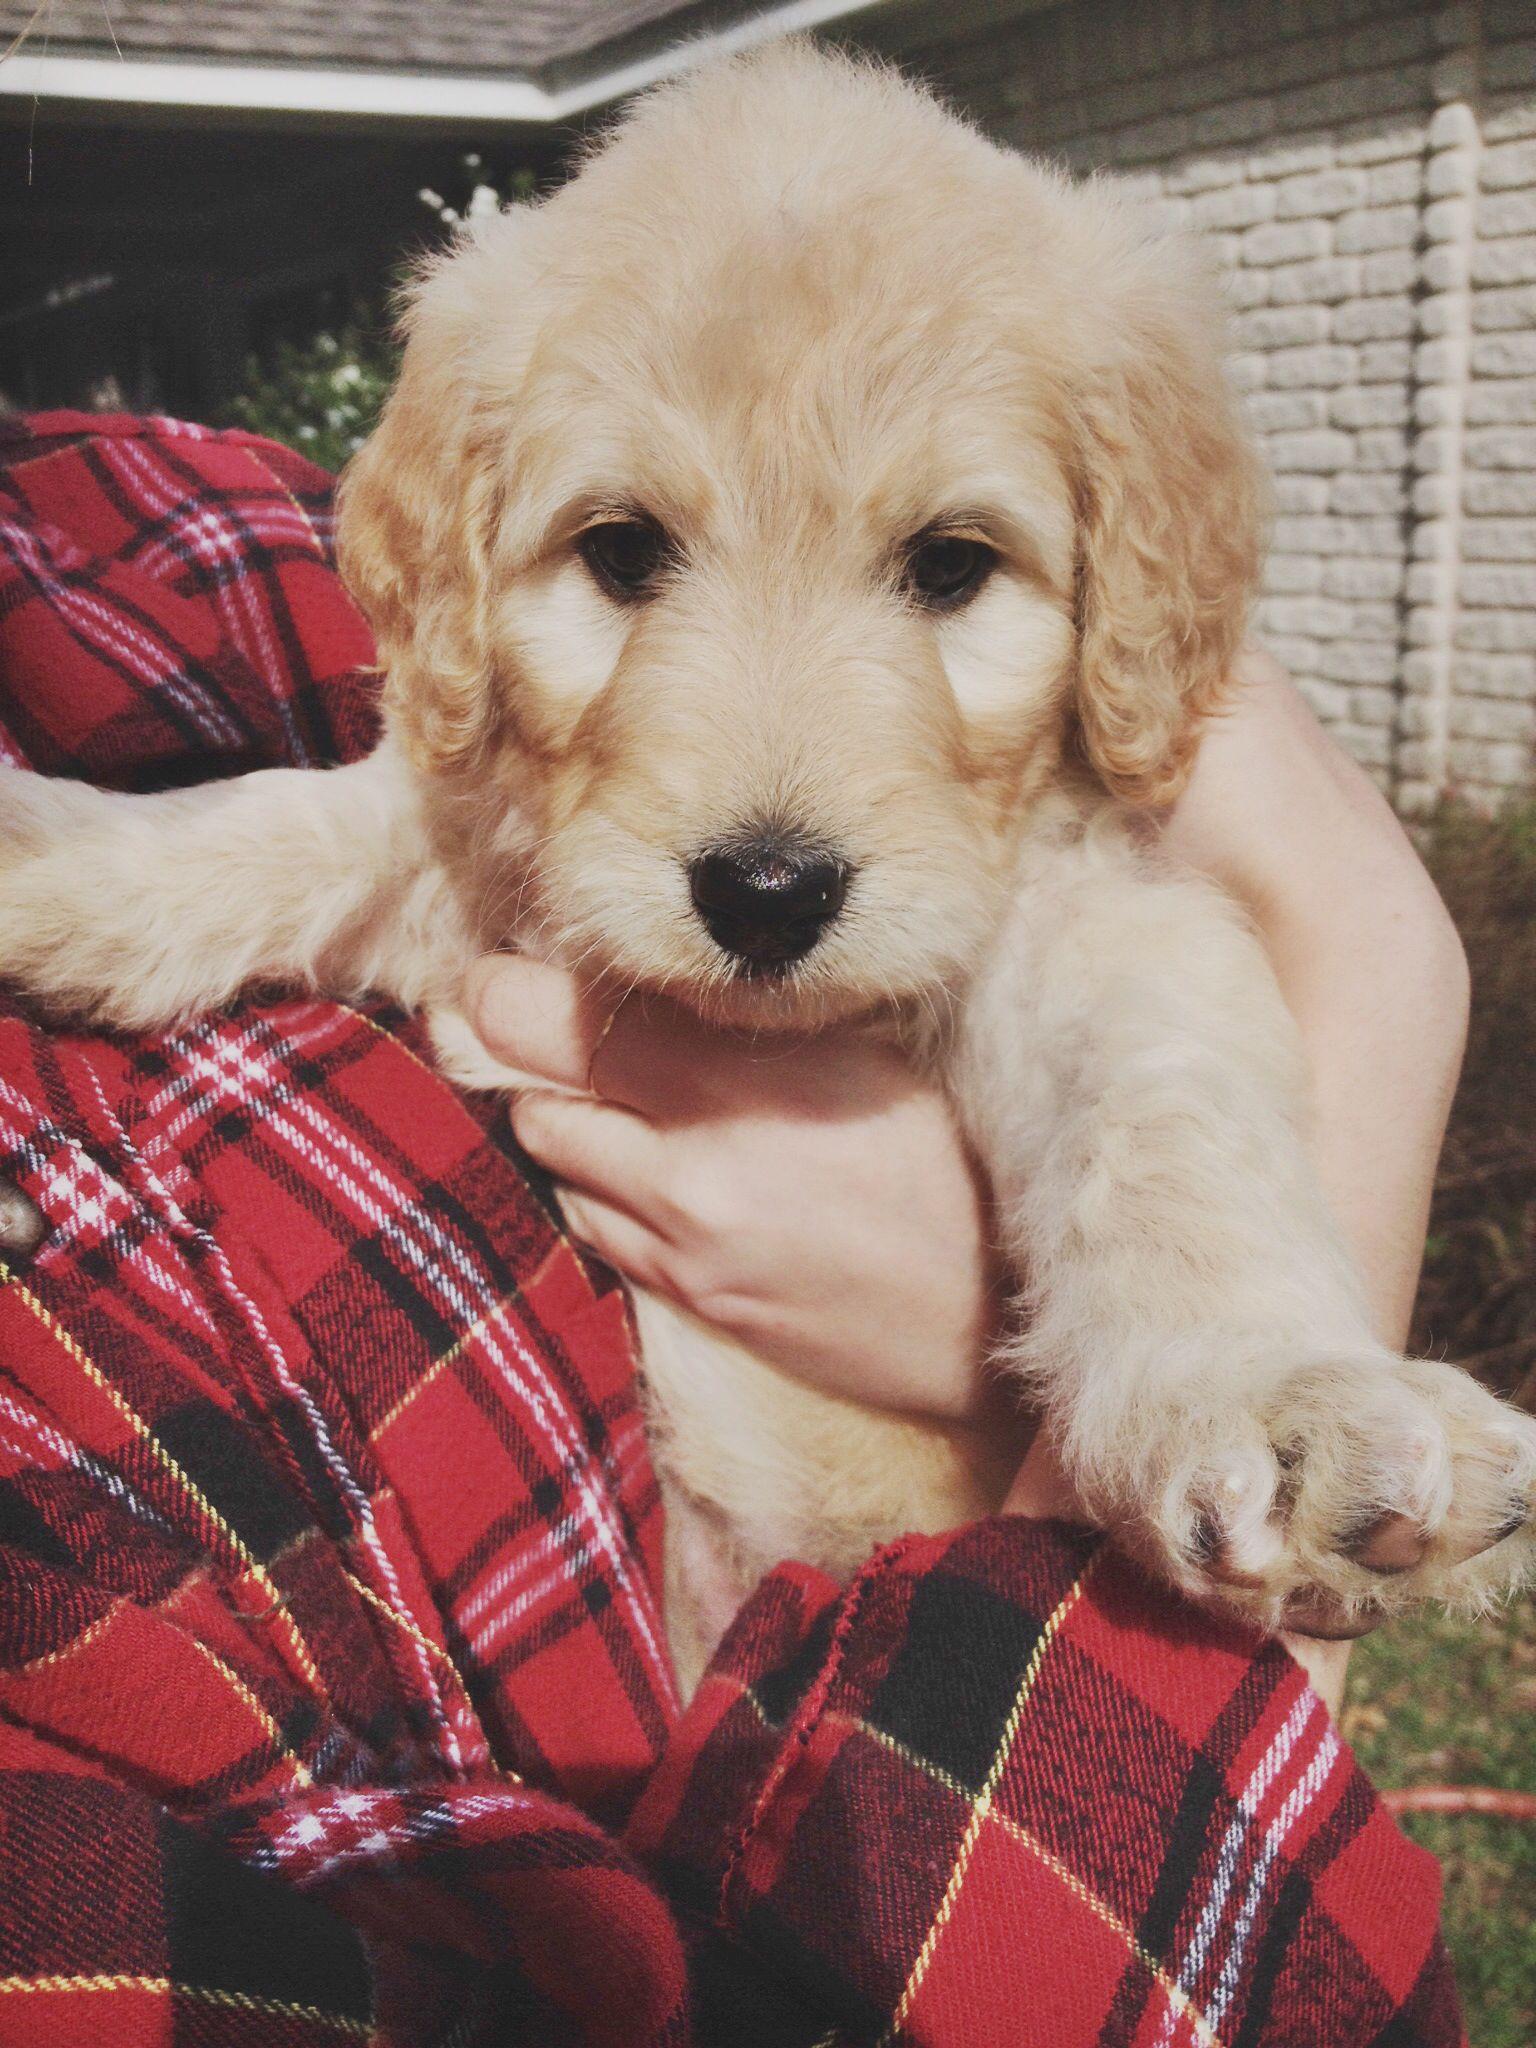 Lily The F1 Standard Goldendoodle Puppy 5 Weeks Old Goldendoodle